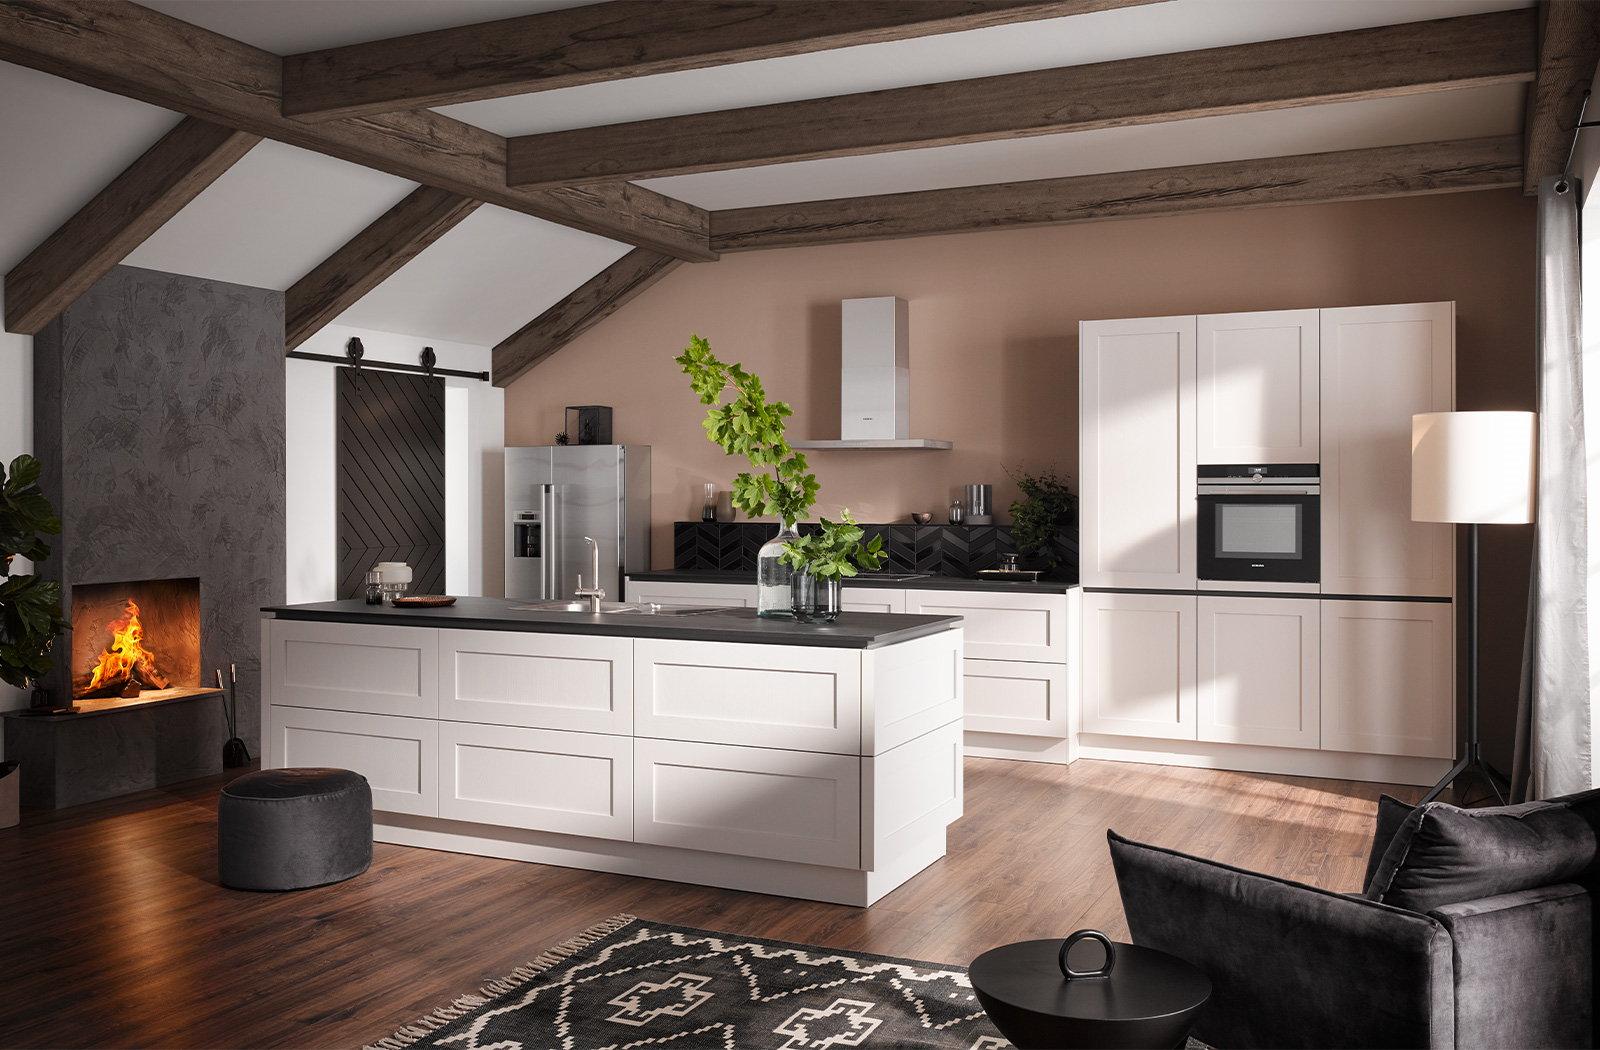 Modern landelijke keuken in parallel vorm – Häcker keuken 6055 GL satin